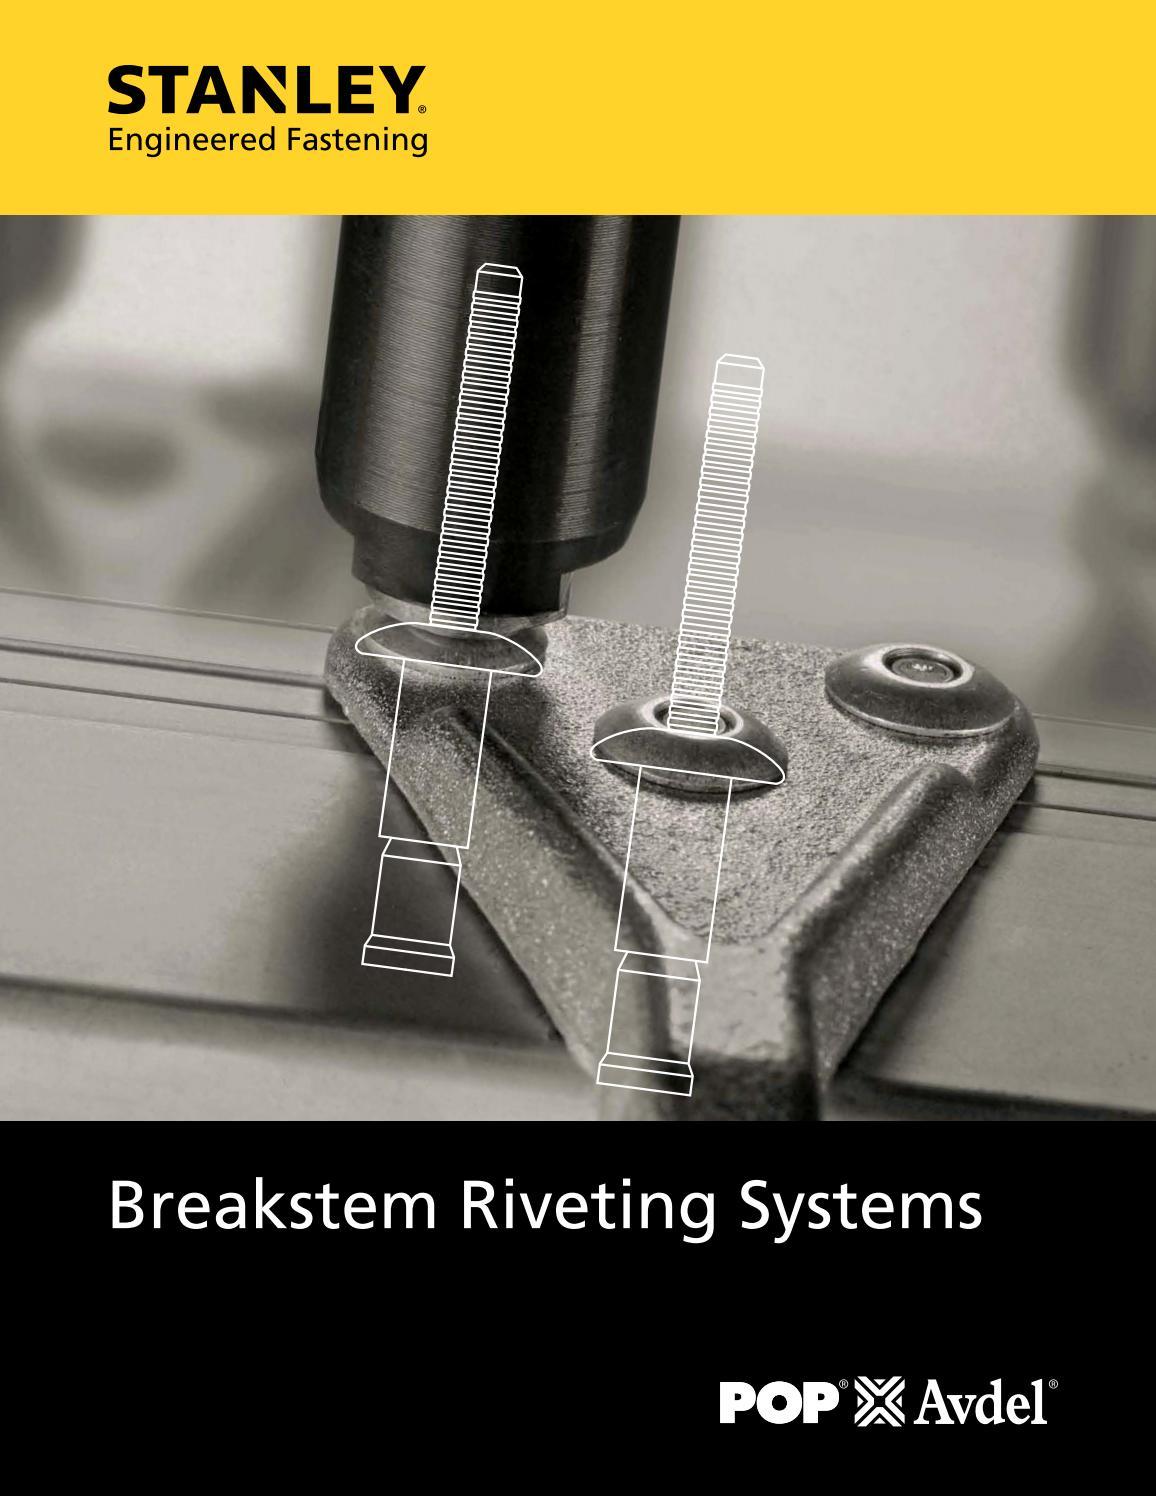 Blind Rivet 250 Bundle 3//16 x 1//8 grip Alum//steel Back up Washers /& Drill Bit!